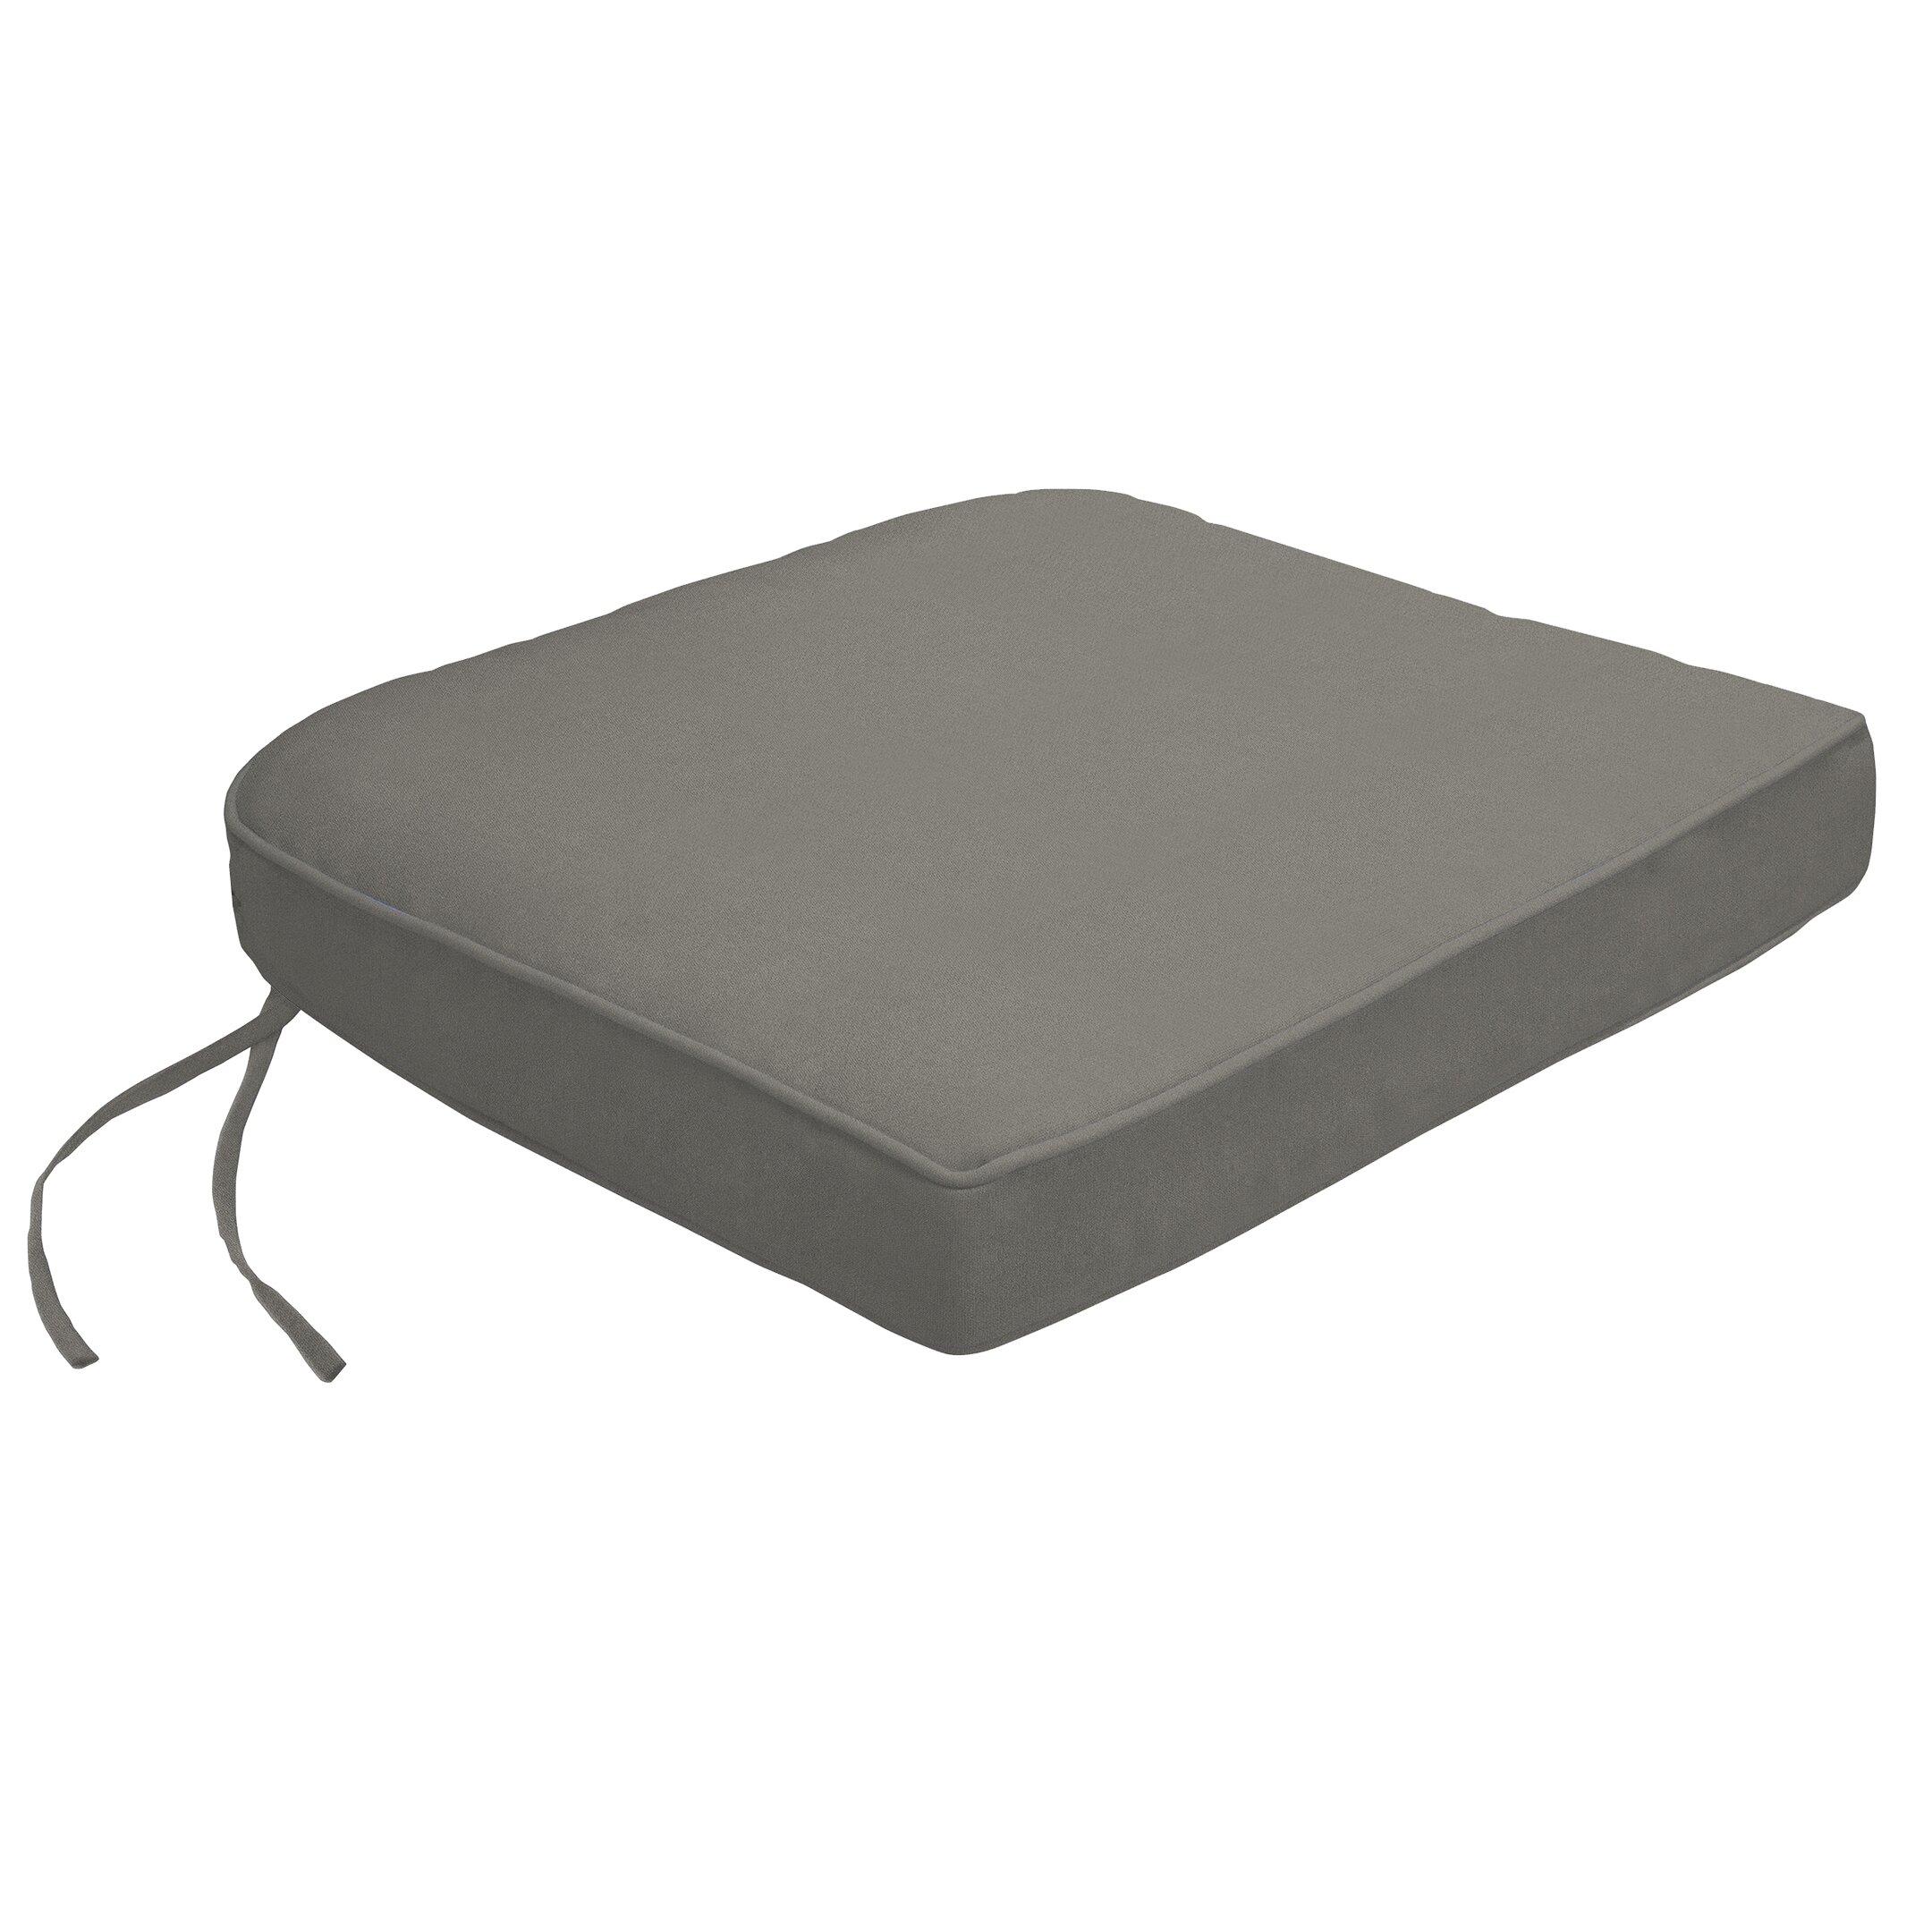 wayfair custom outdoor cushions double piped outdoor sunbrella contour